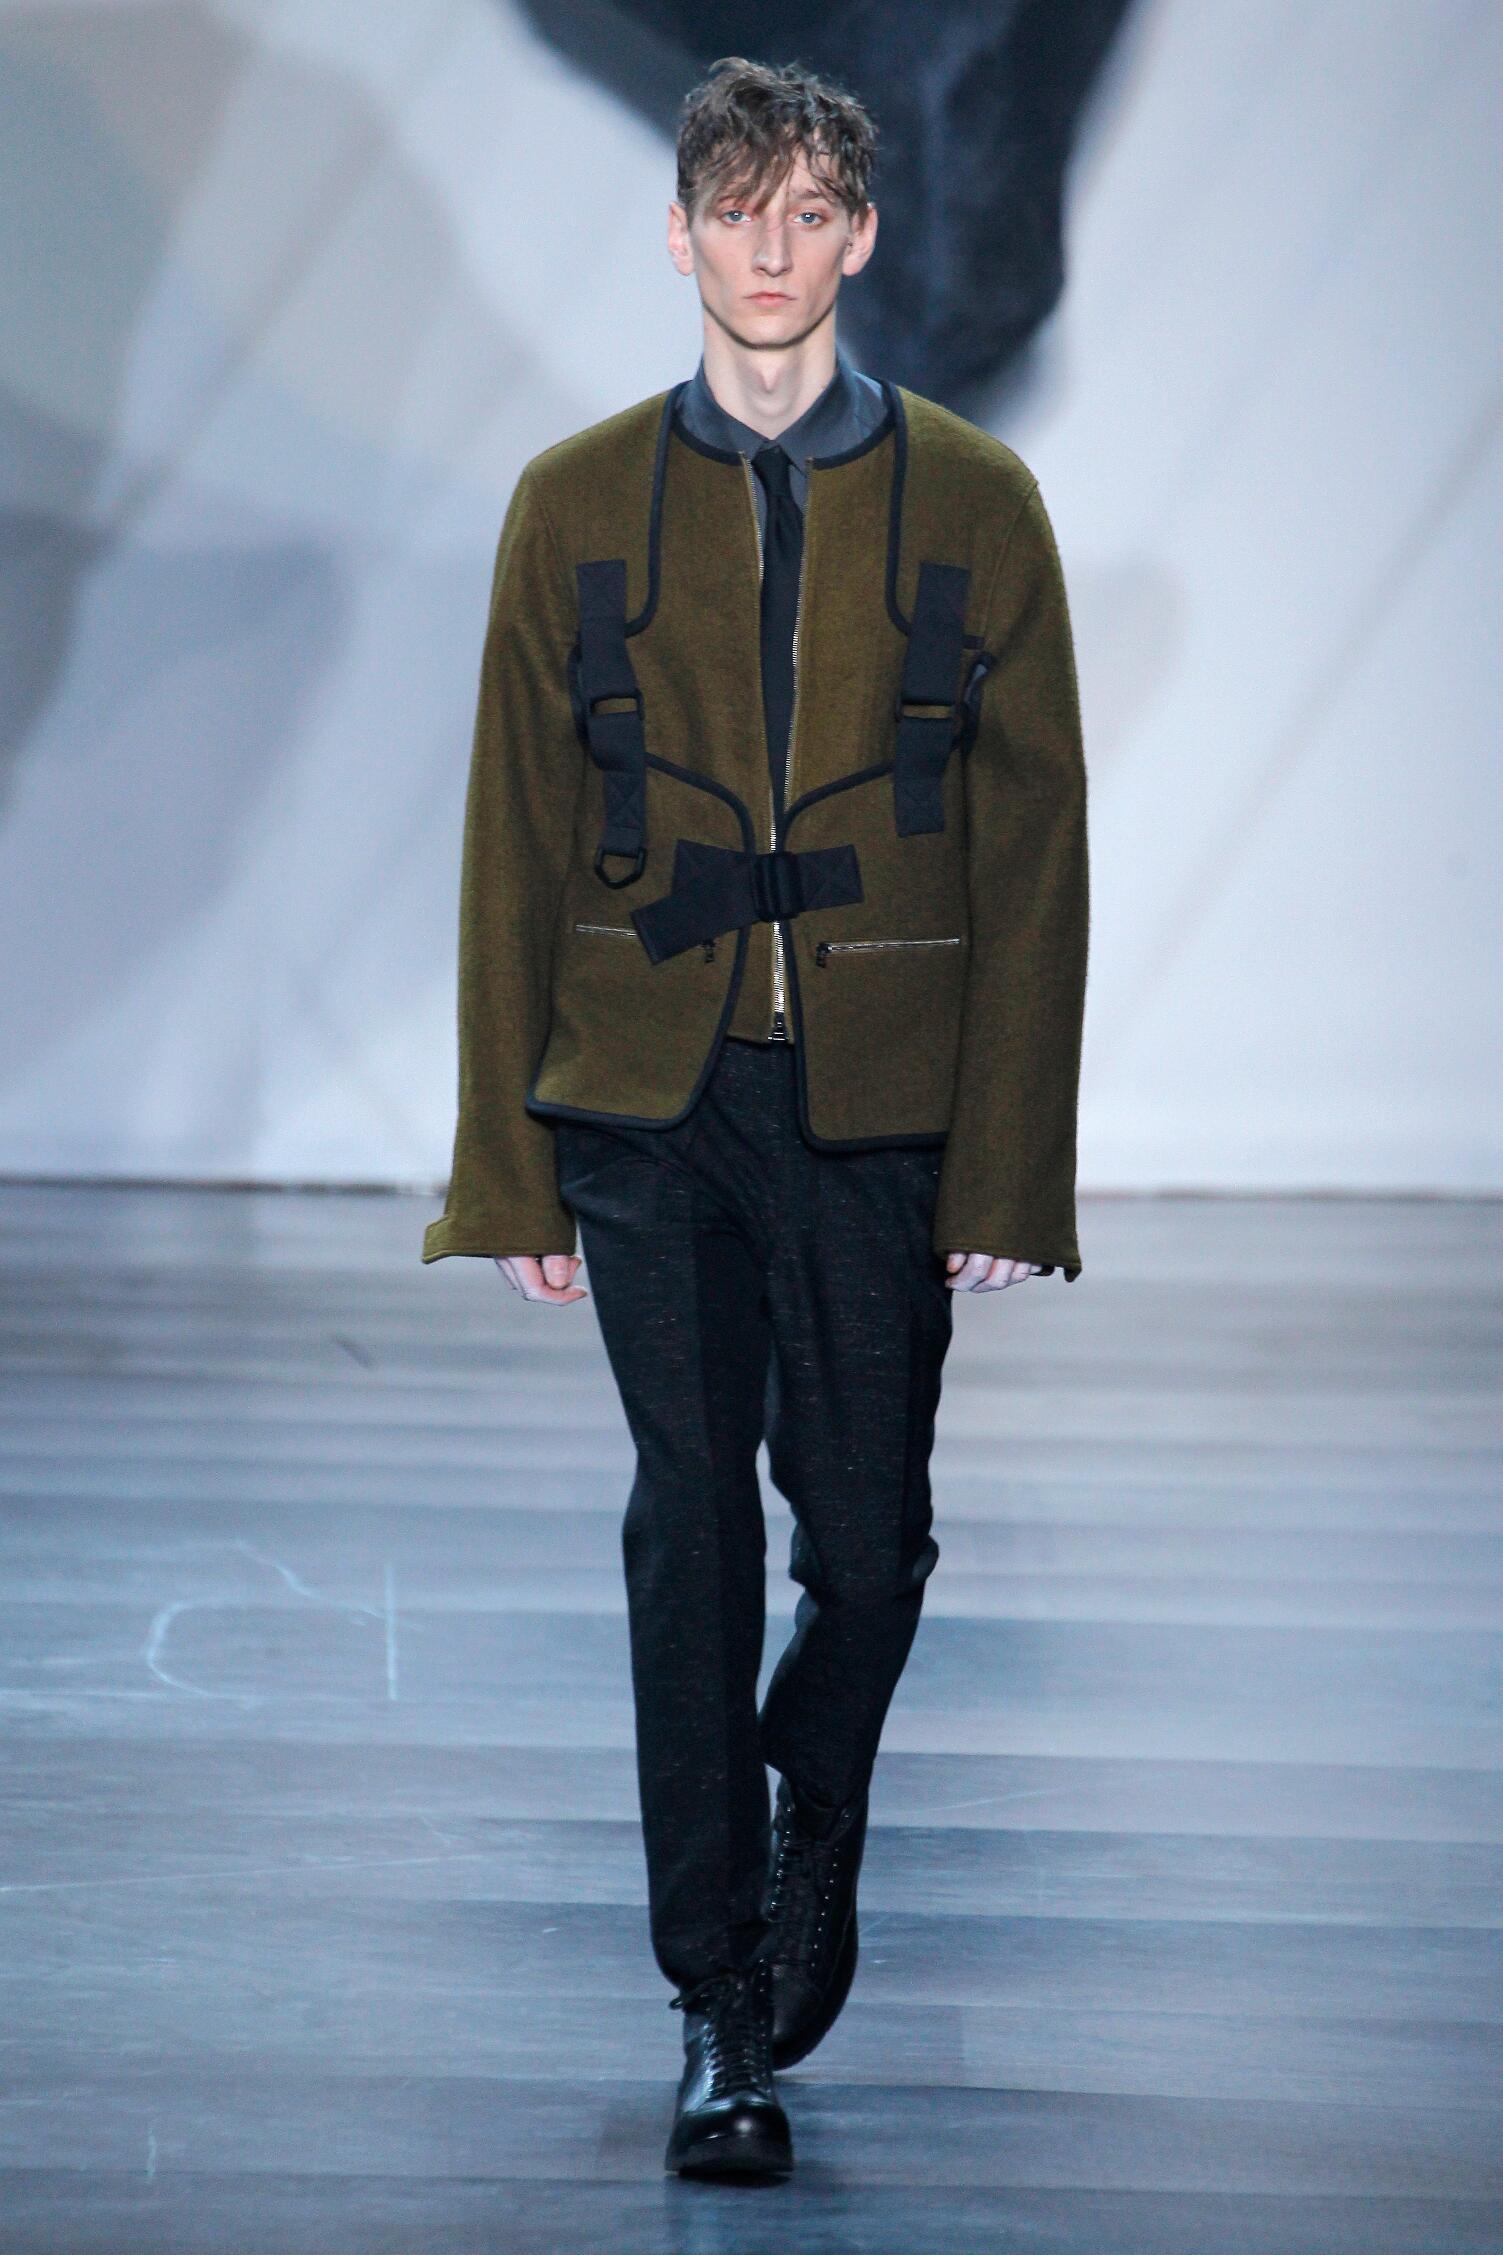 Fall Fashion Man 3.1 Phillip Lim Collection